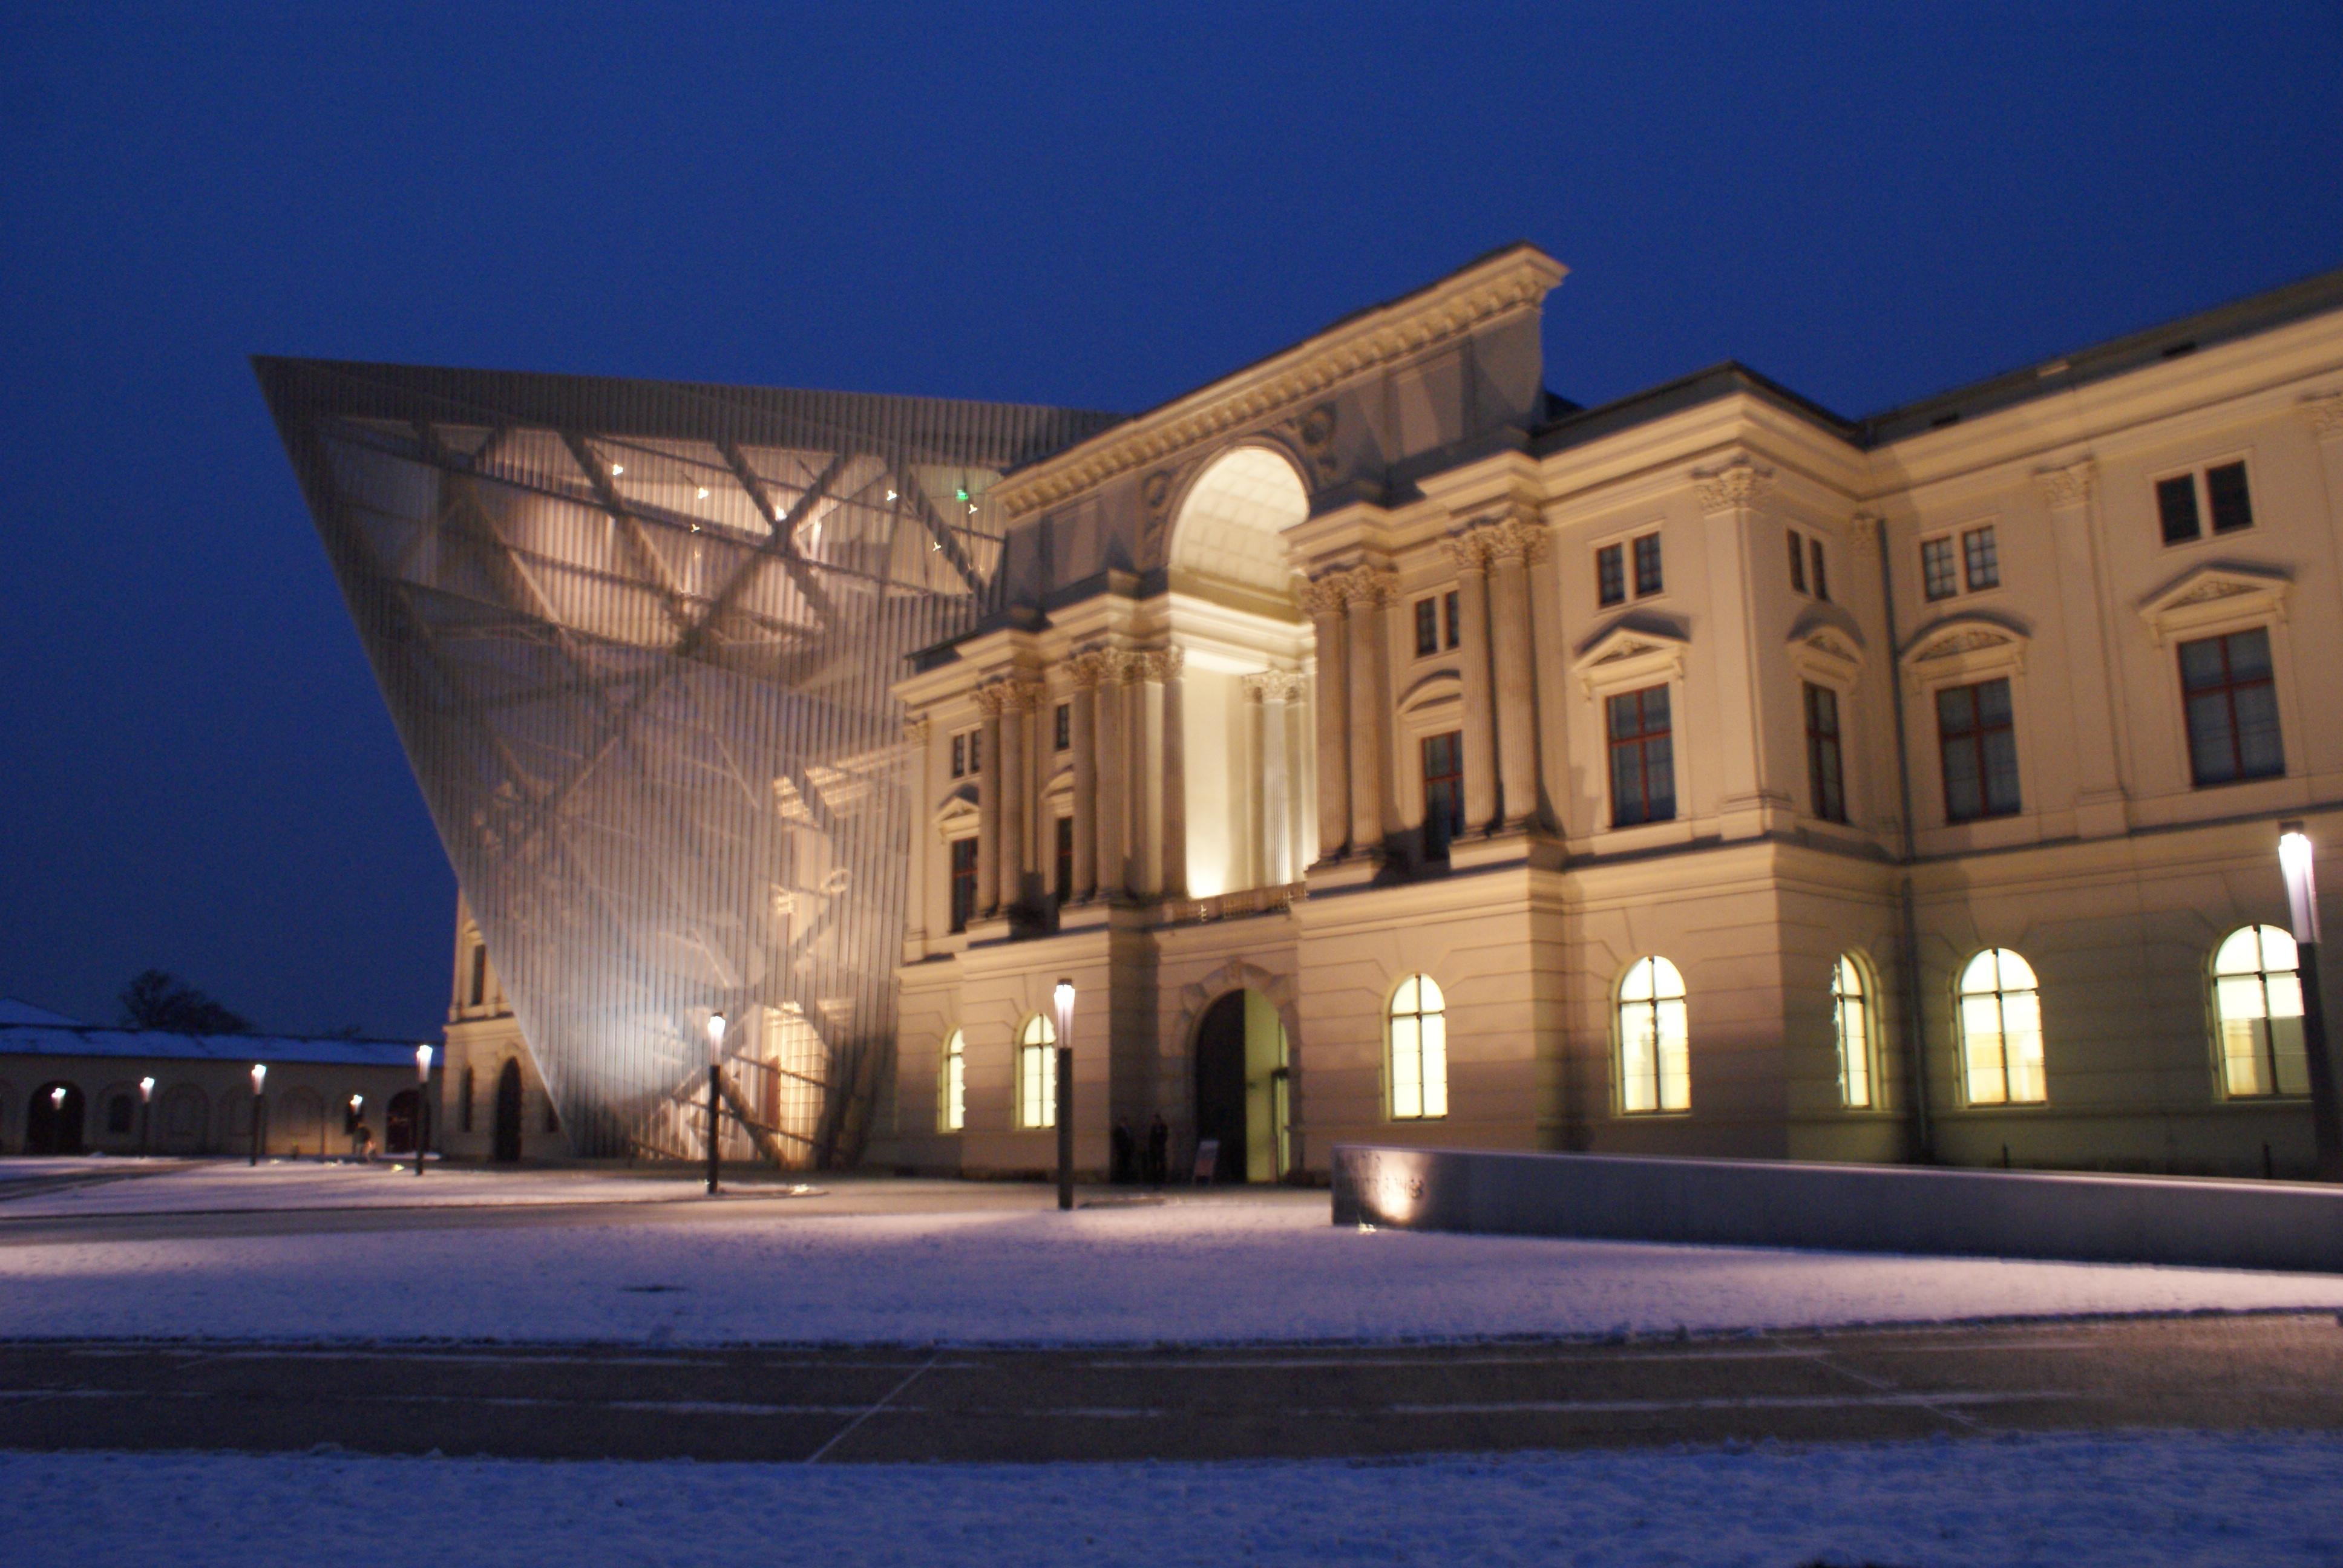 Vue de la façade du Militärhistorisches Museum de Dresde.